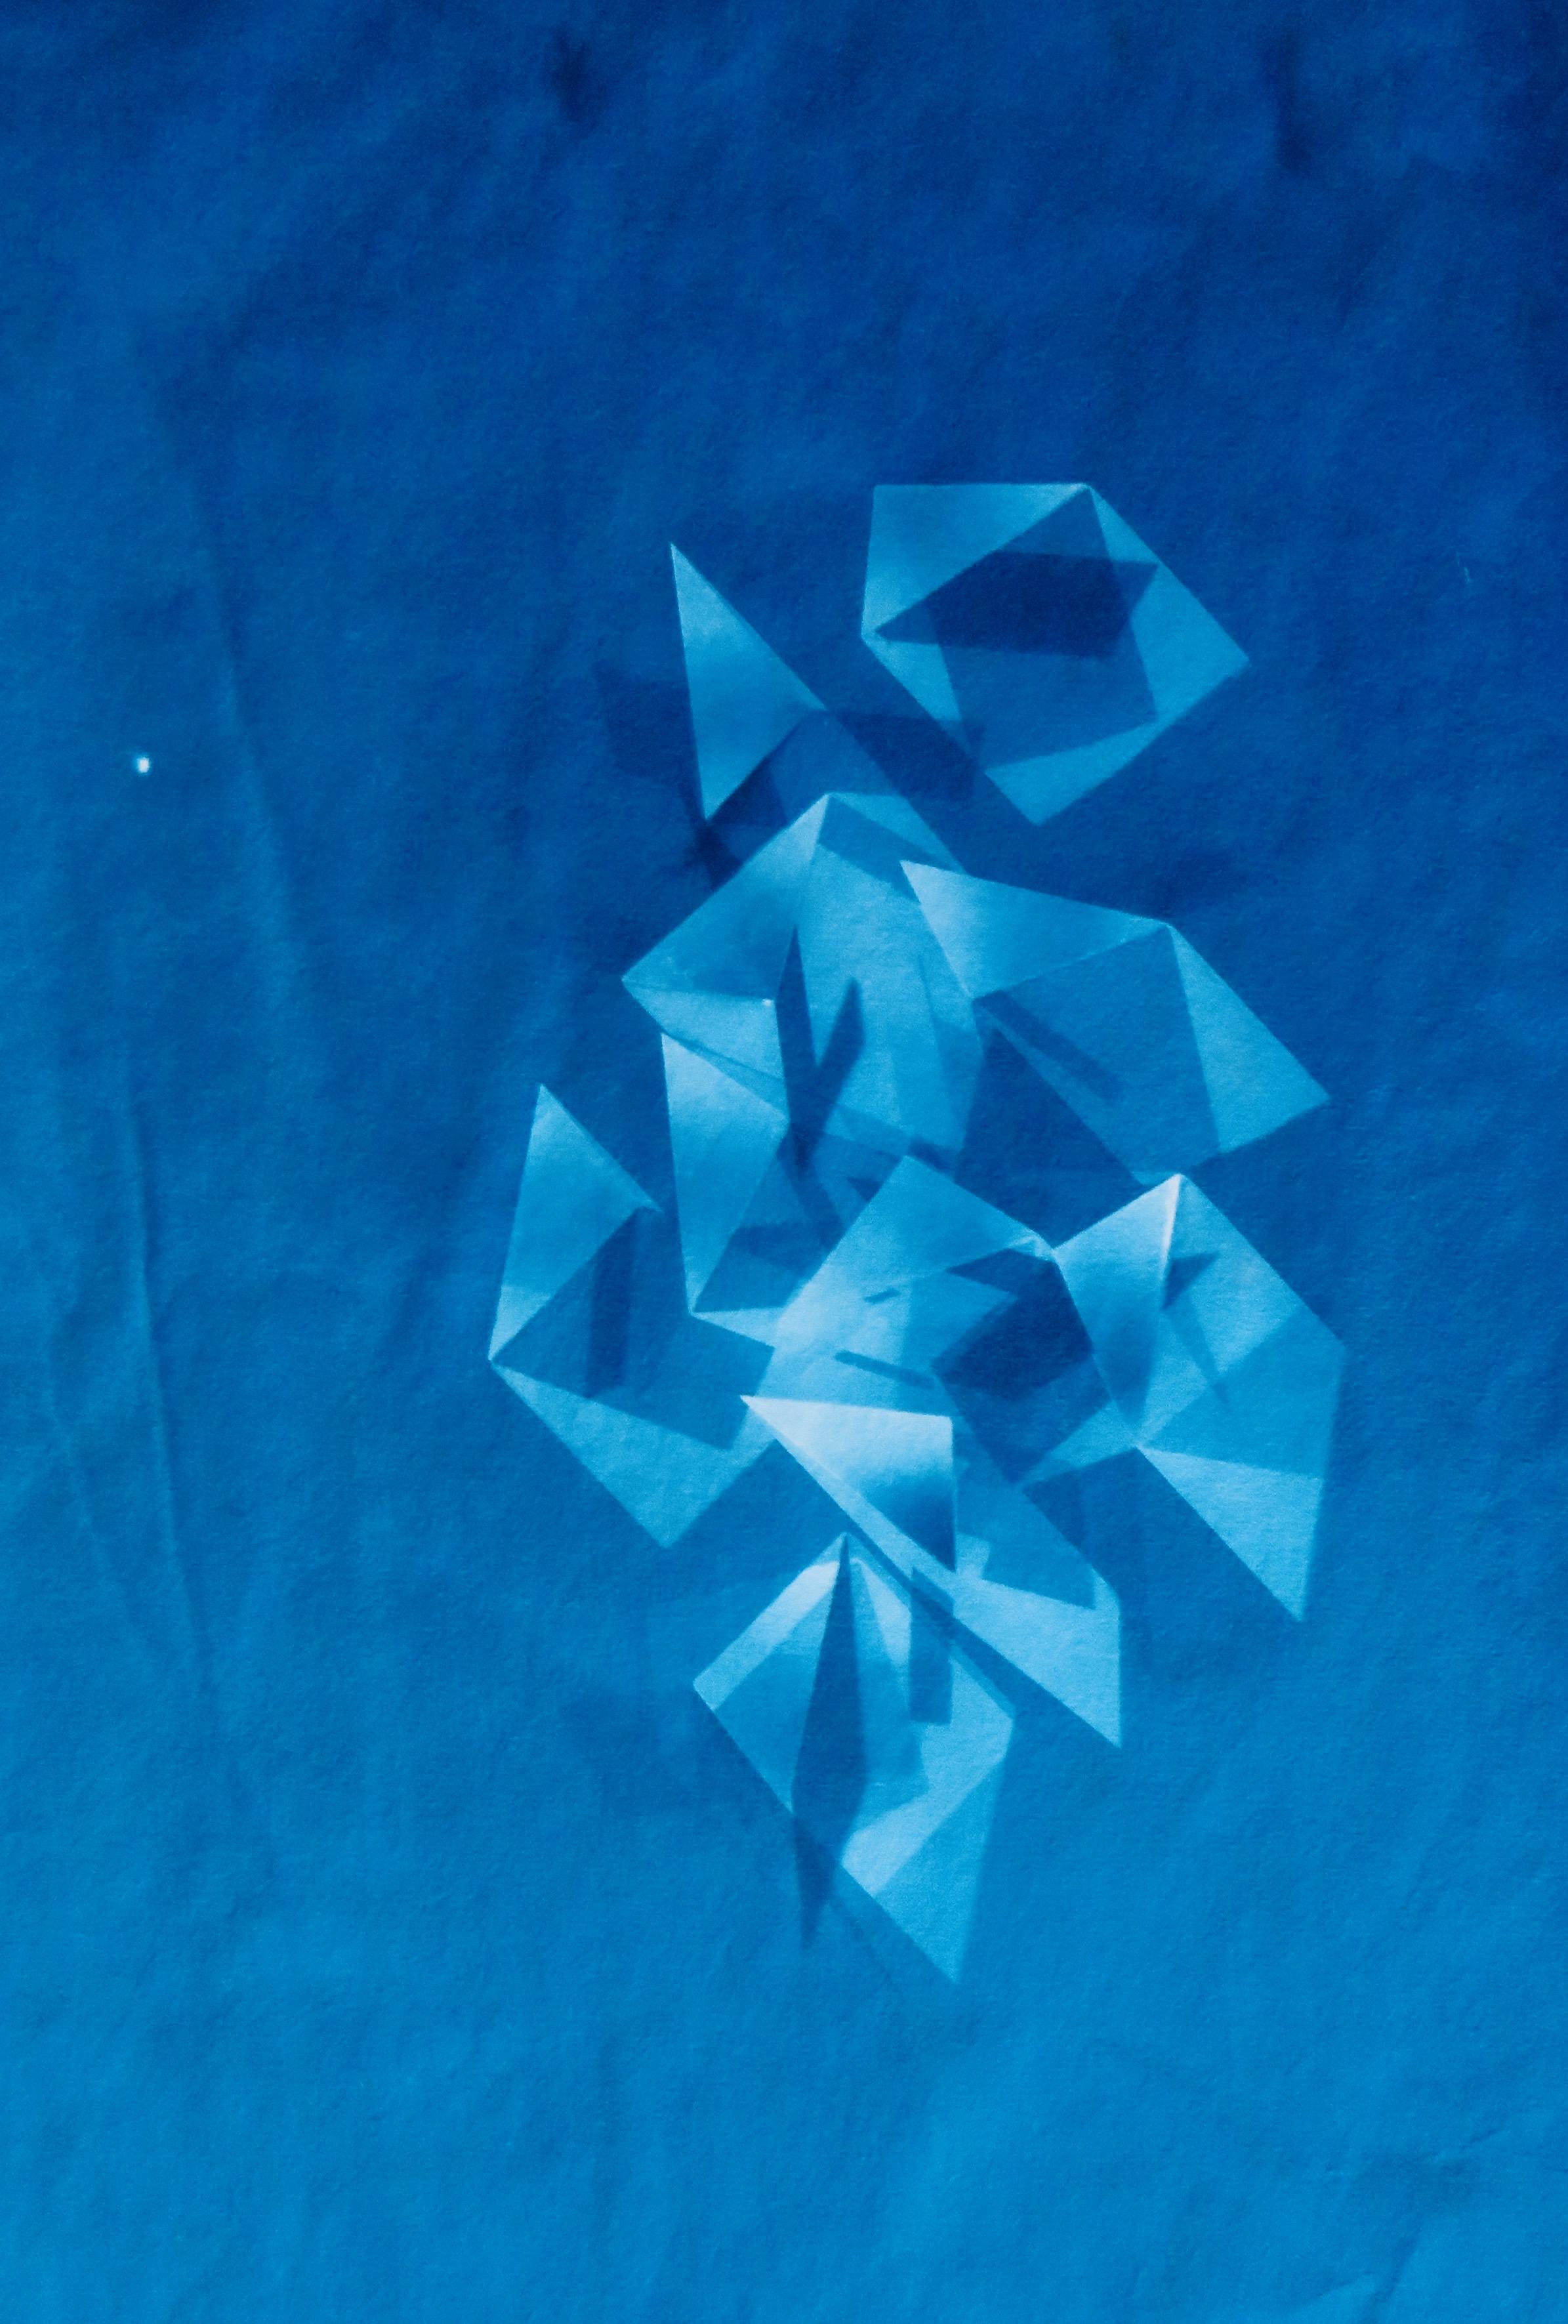 Prism # 4